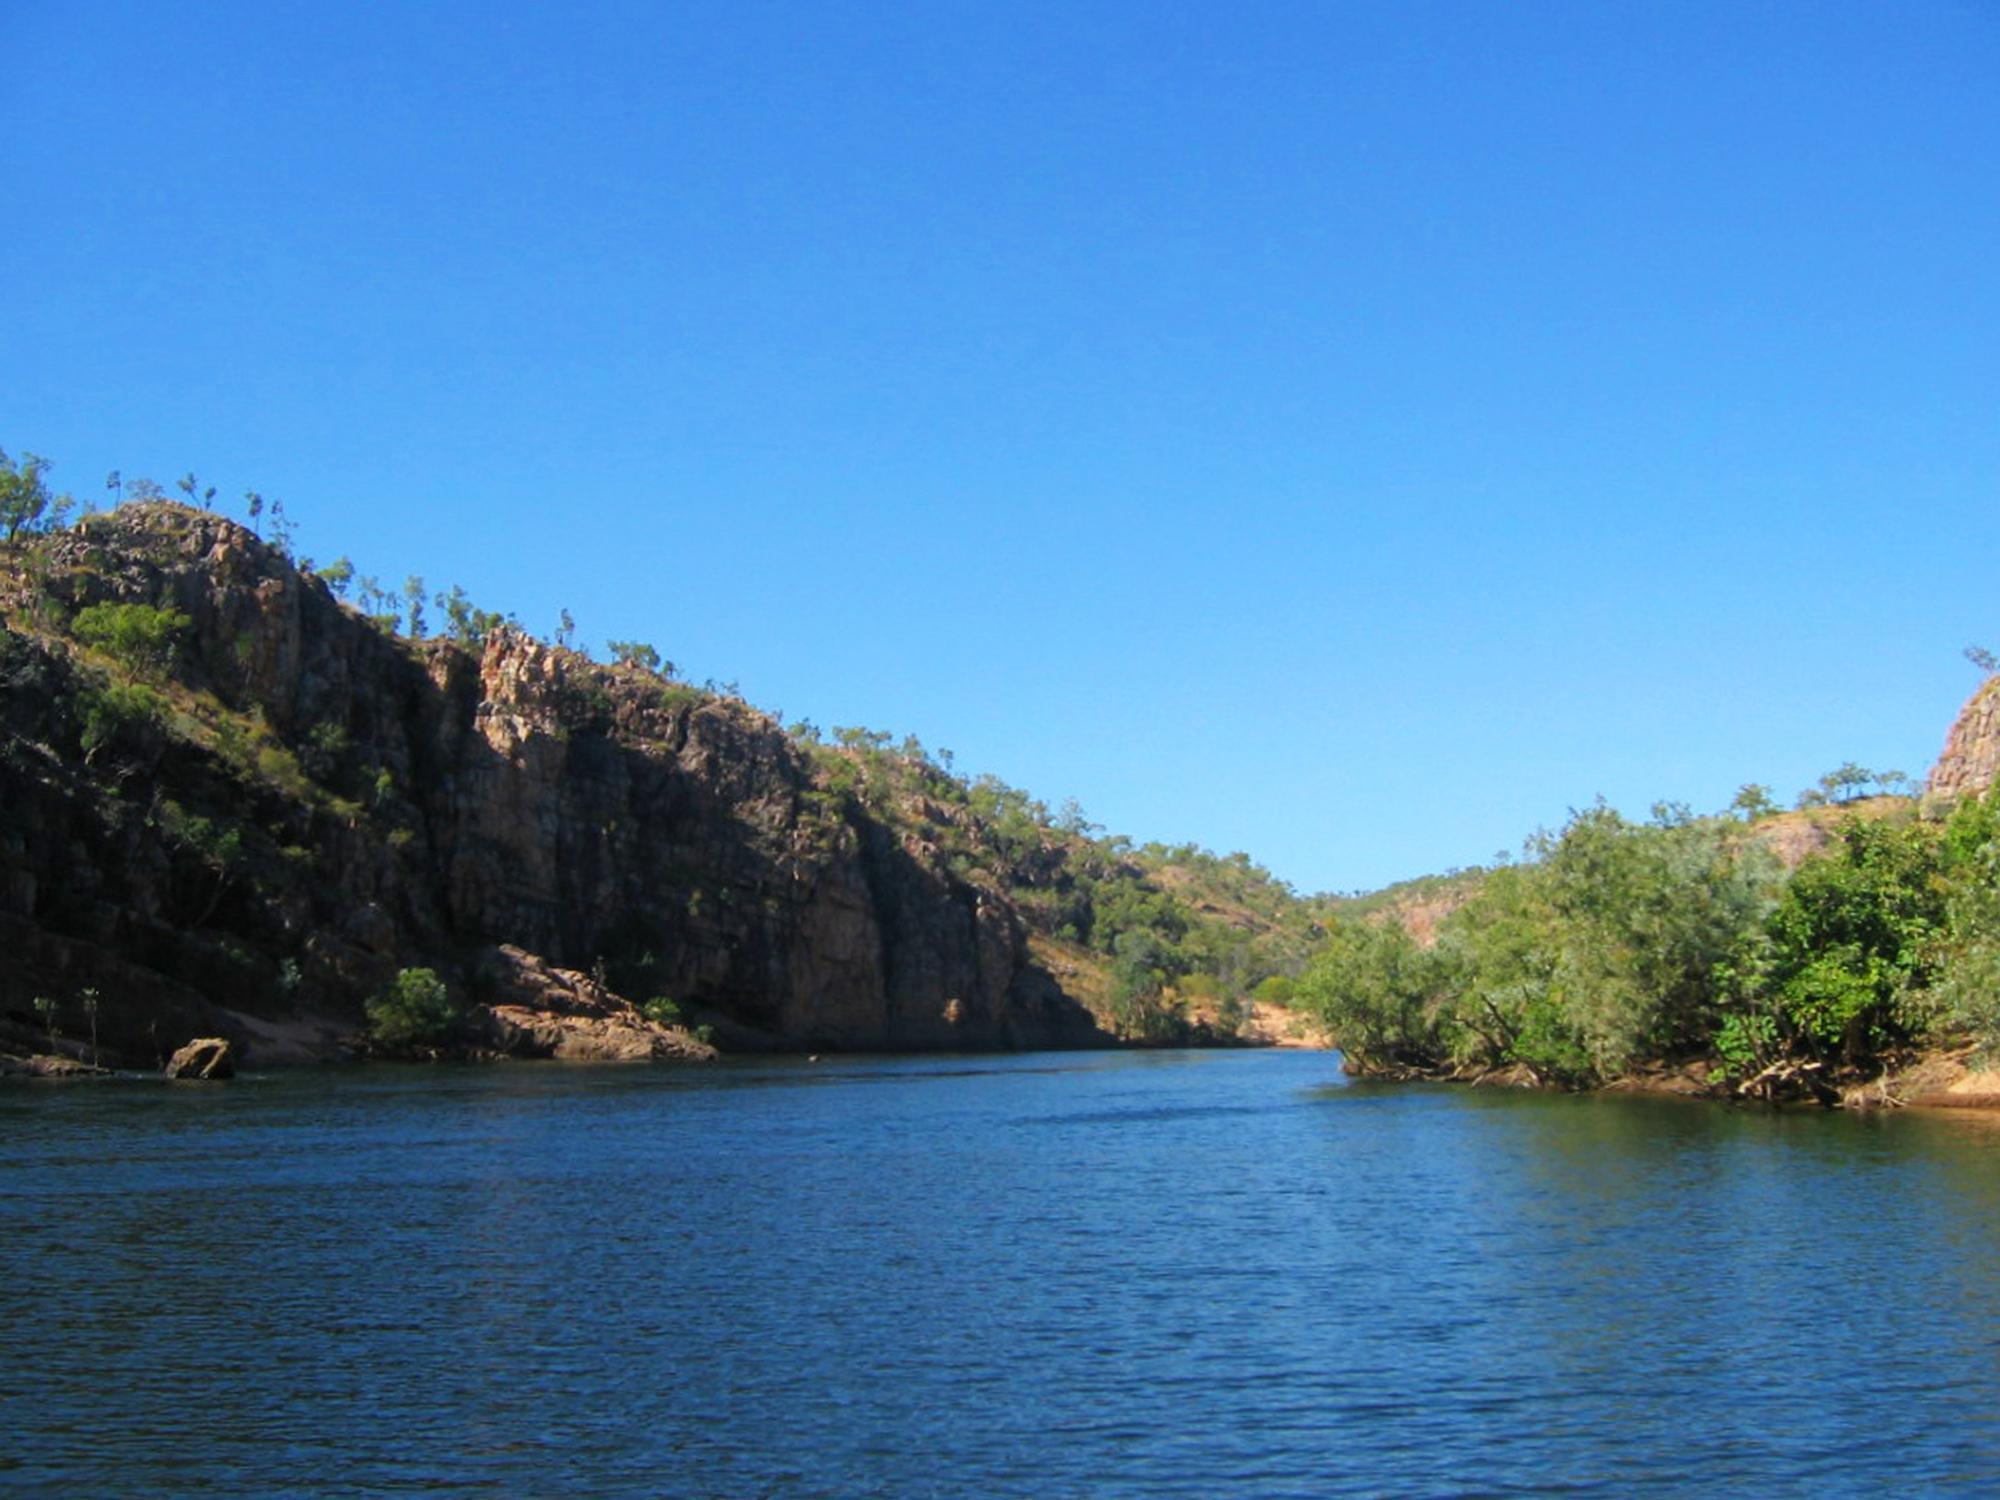 Road trip en Australie - Cairns